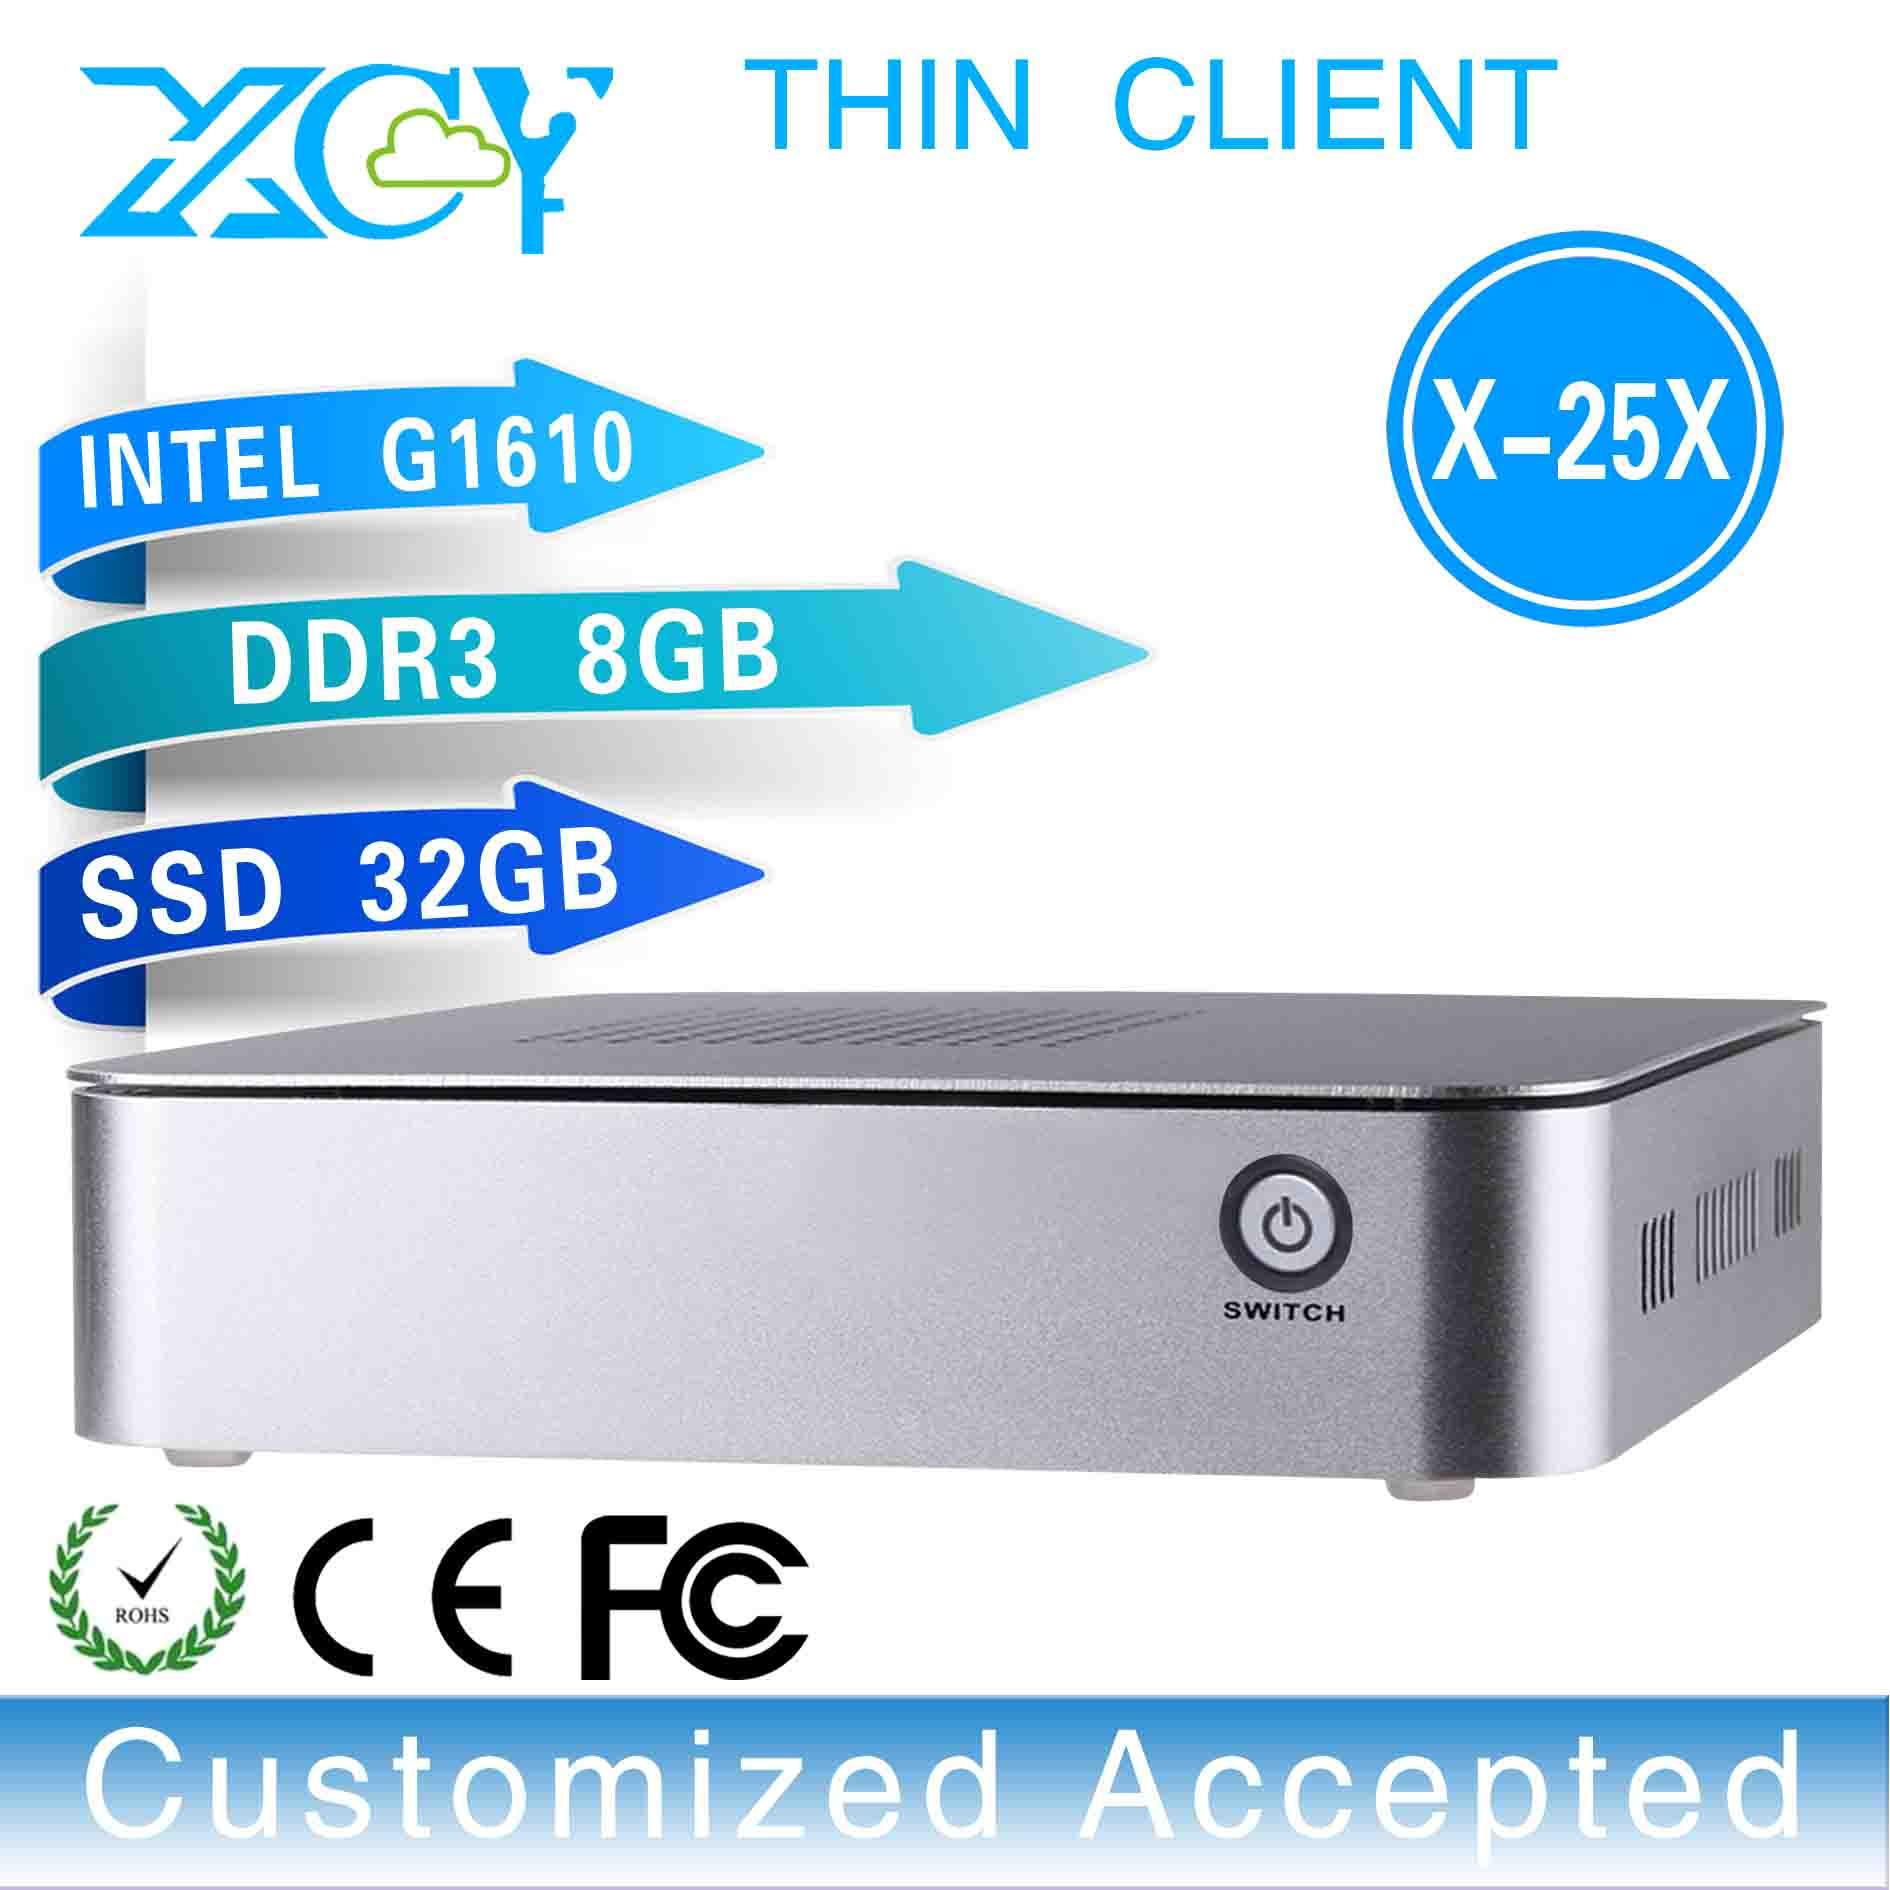 window 8 fan pc G1610 fan mini pc industrial robot industrial chain X-25x G1610 8GB RAM 32GB SSD with 4*USB2.0 etc.(China (Mainland))